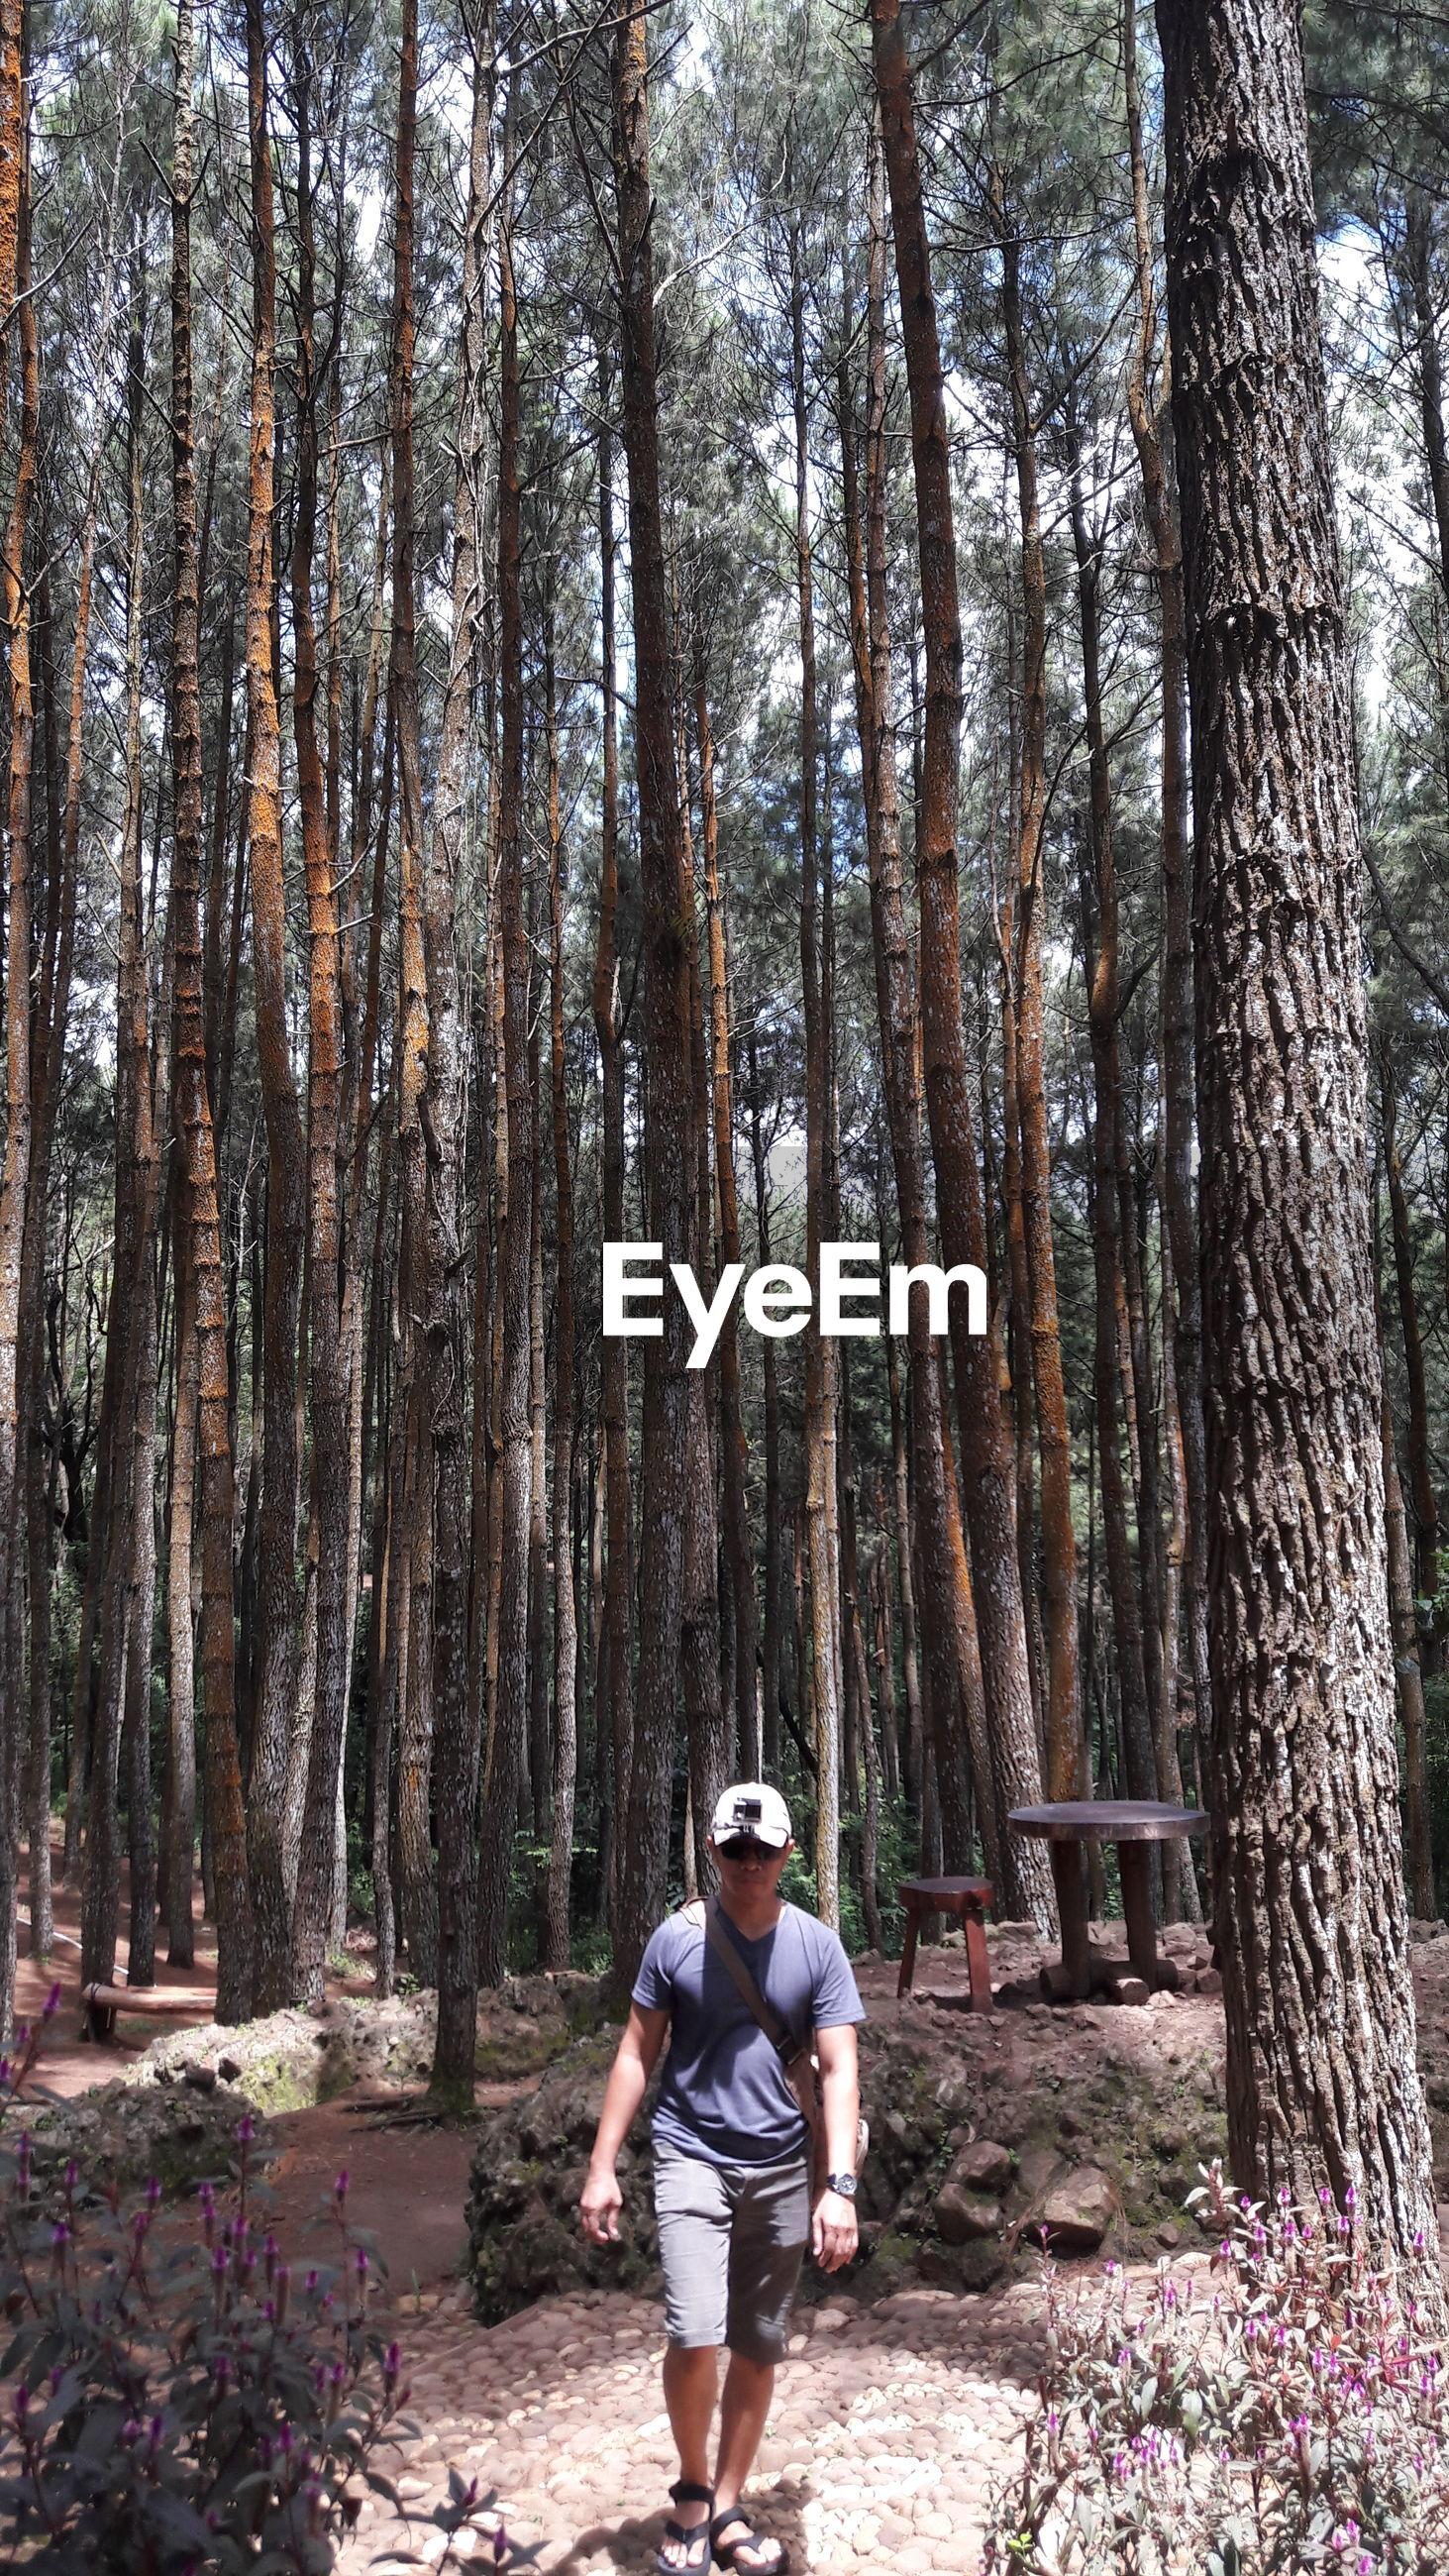 Full length of man standing against trees in forest